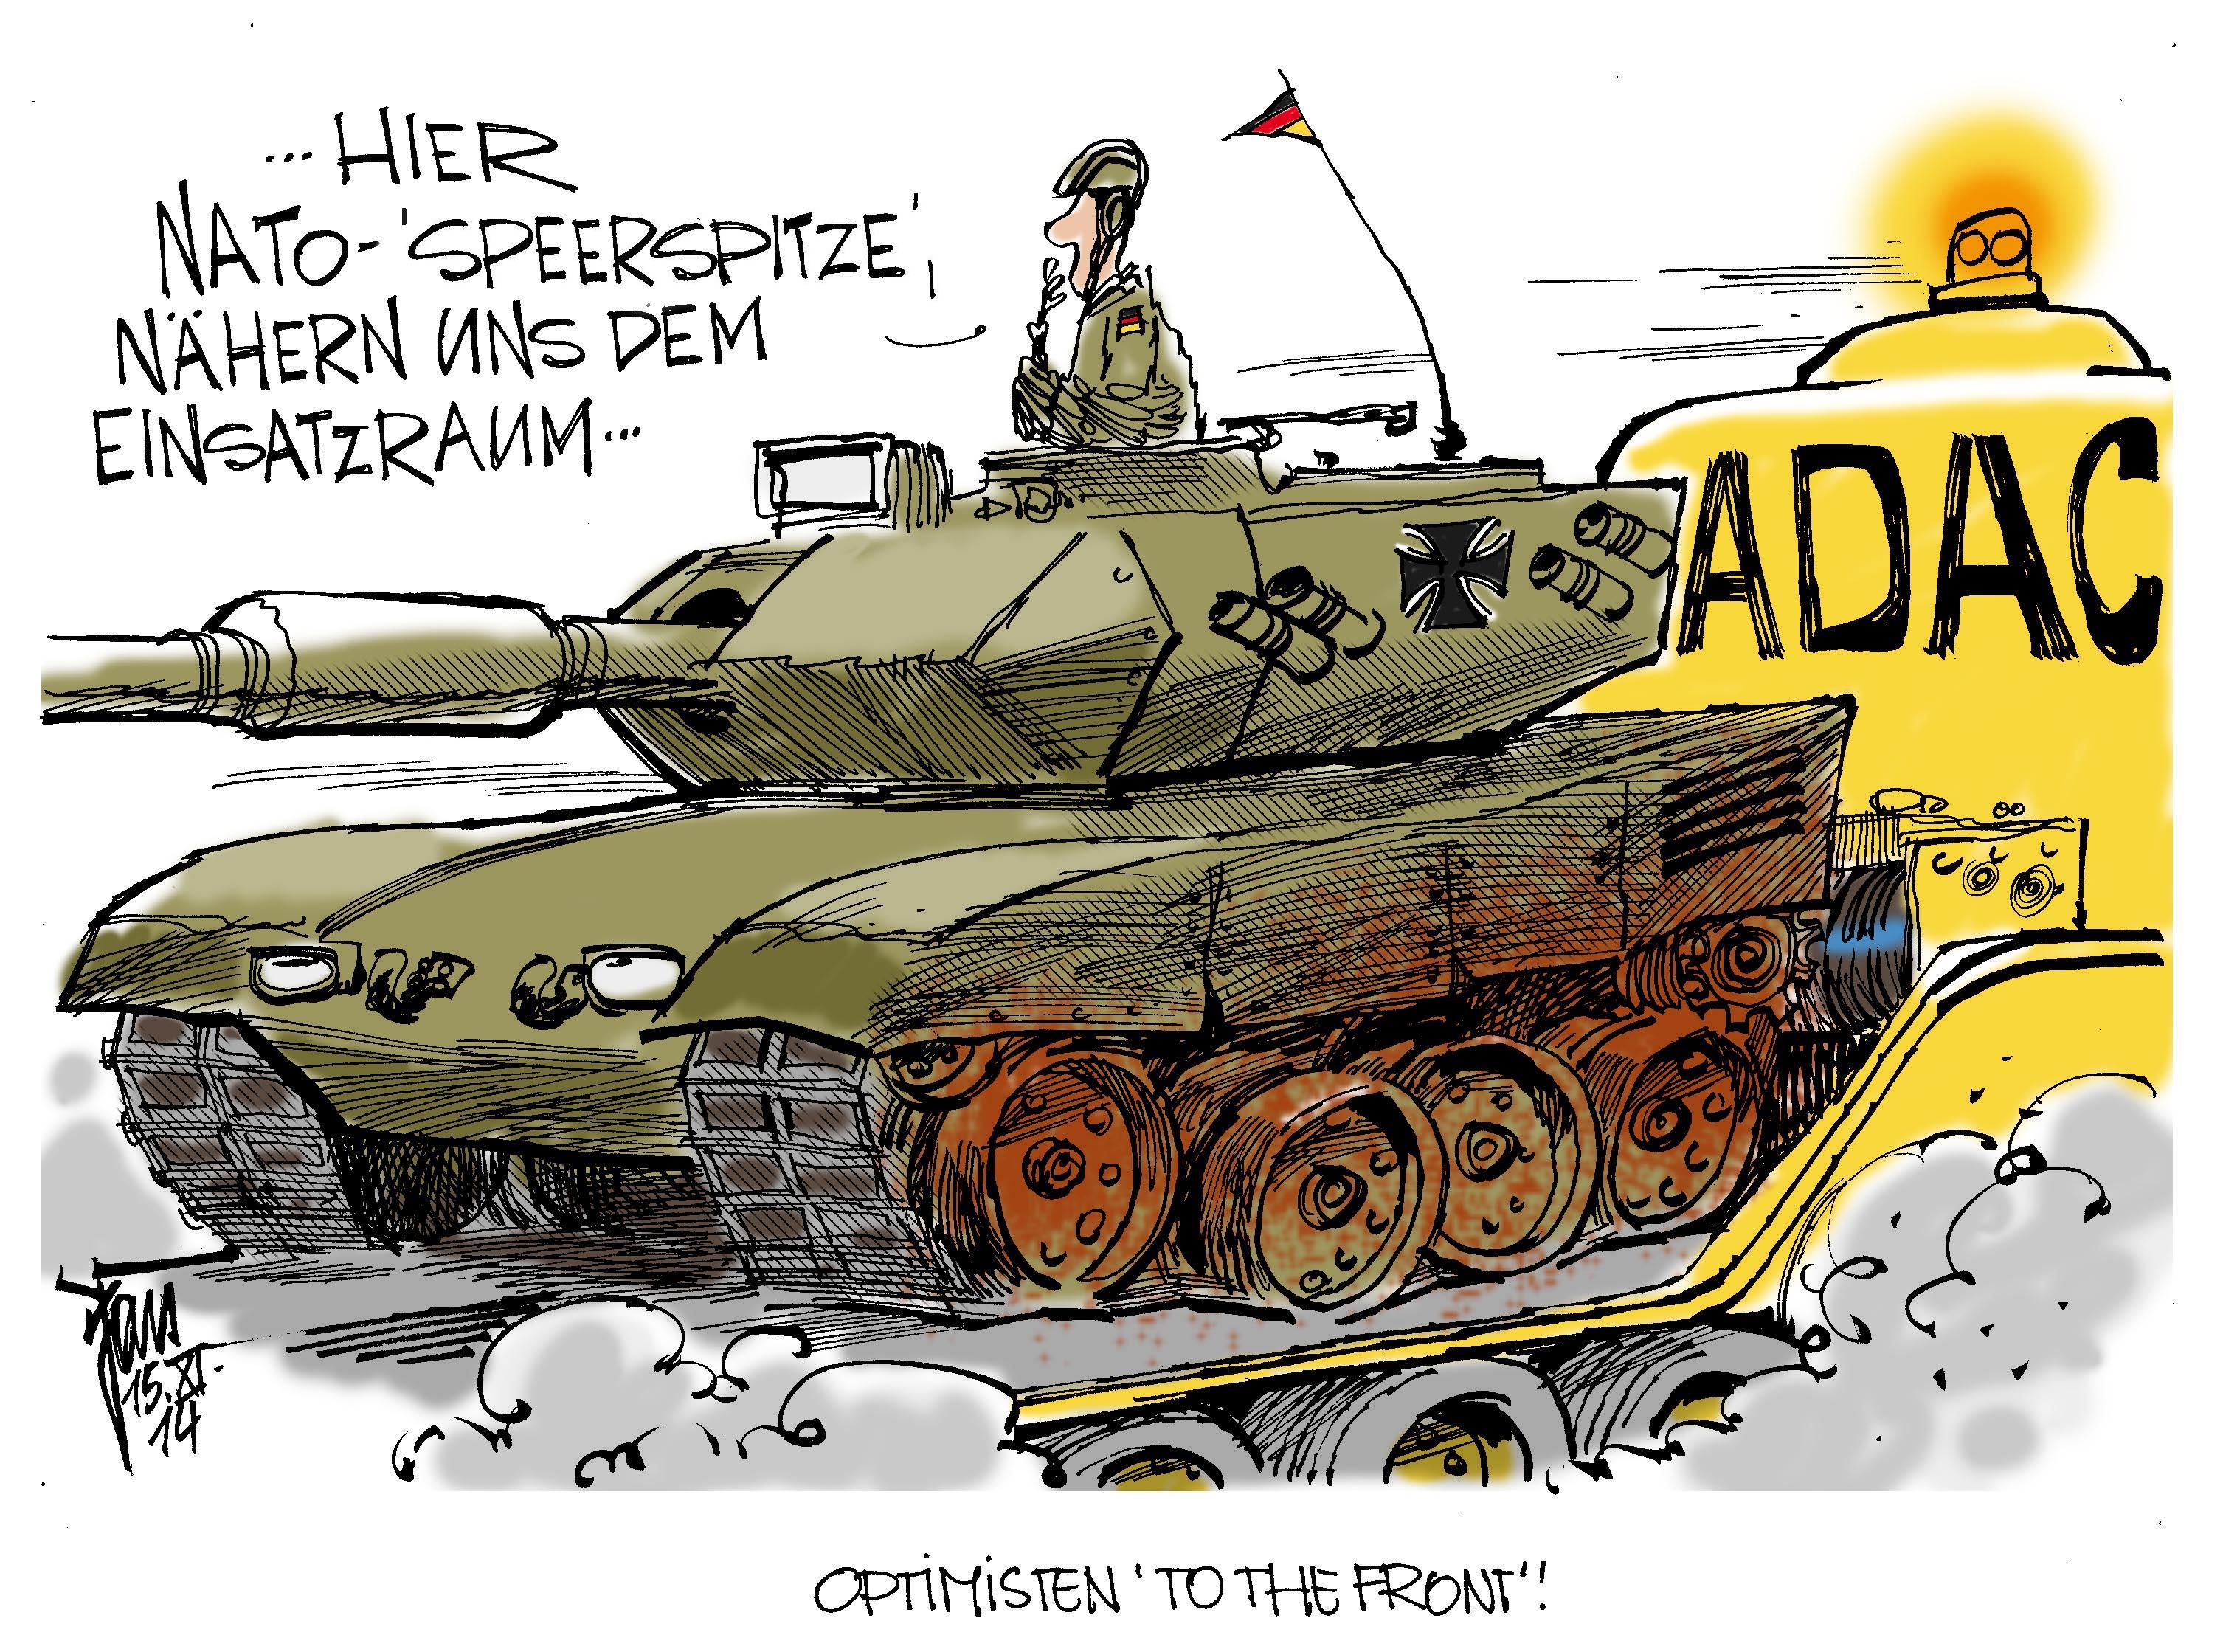 Nato-Speerspitze-14-11-15-rgb.jpg